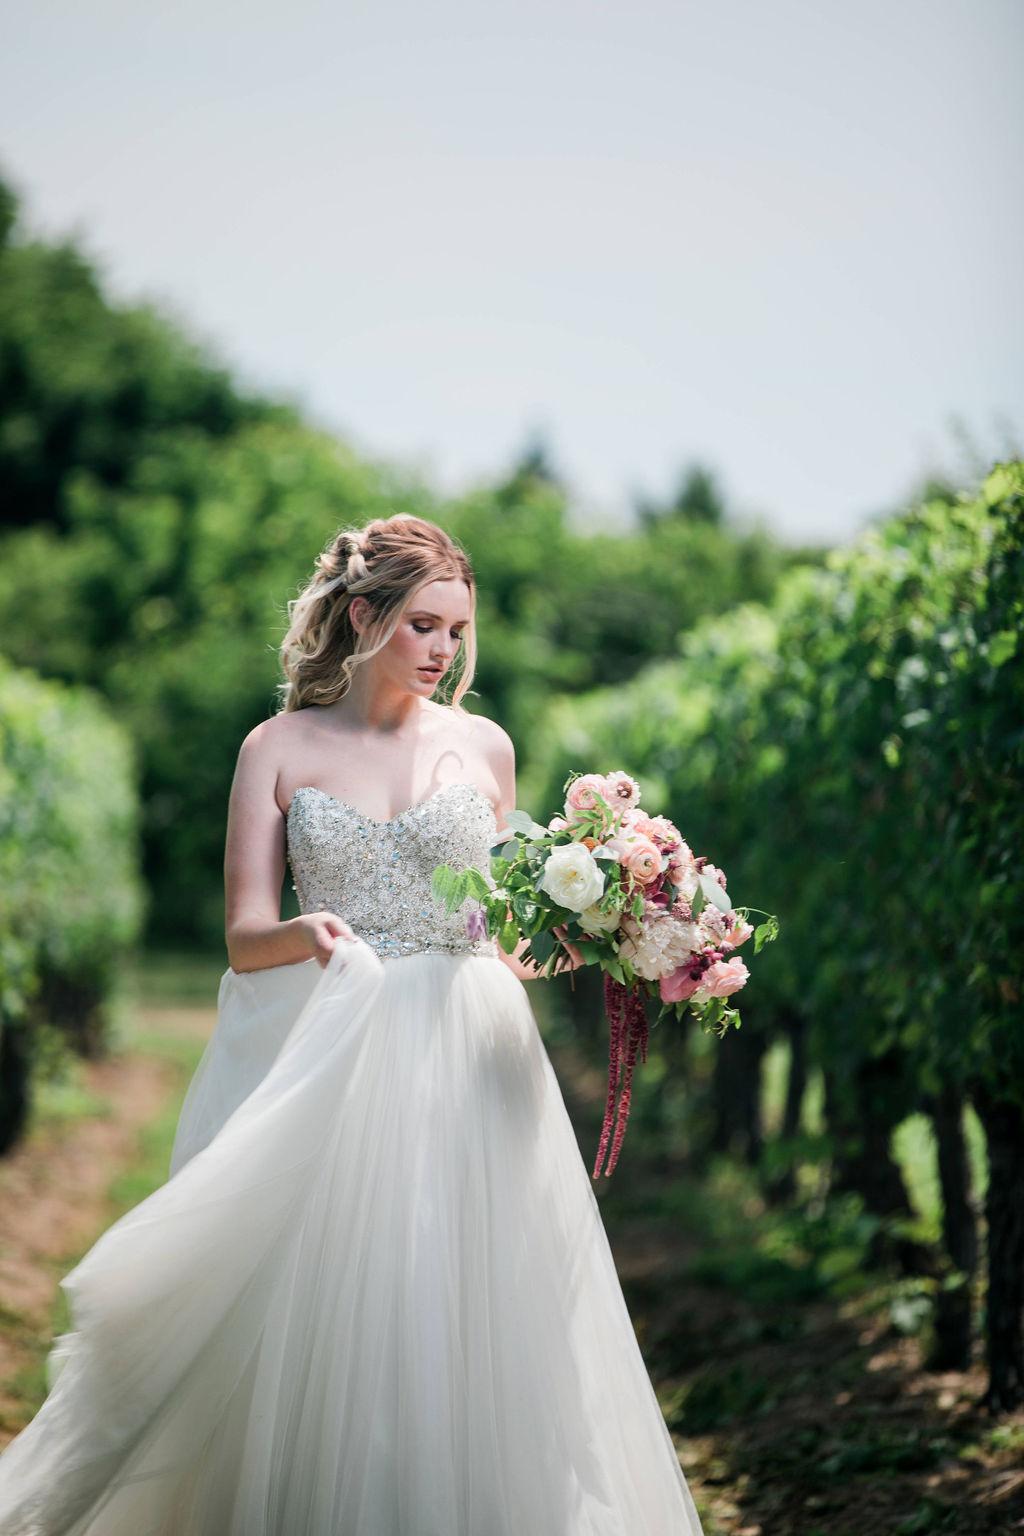 Kurtz-Orchards-Niagara-on-the-Lake-Styled-Wedding-Session-Shotlife-Studio-Calderone-Co-Luxury-Events-Vineyard-Bride-39.JPG